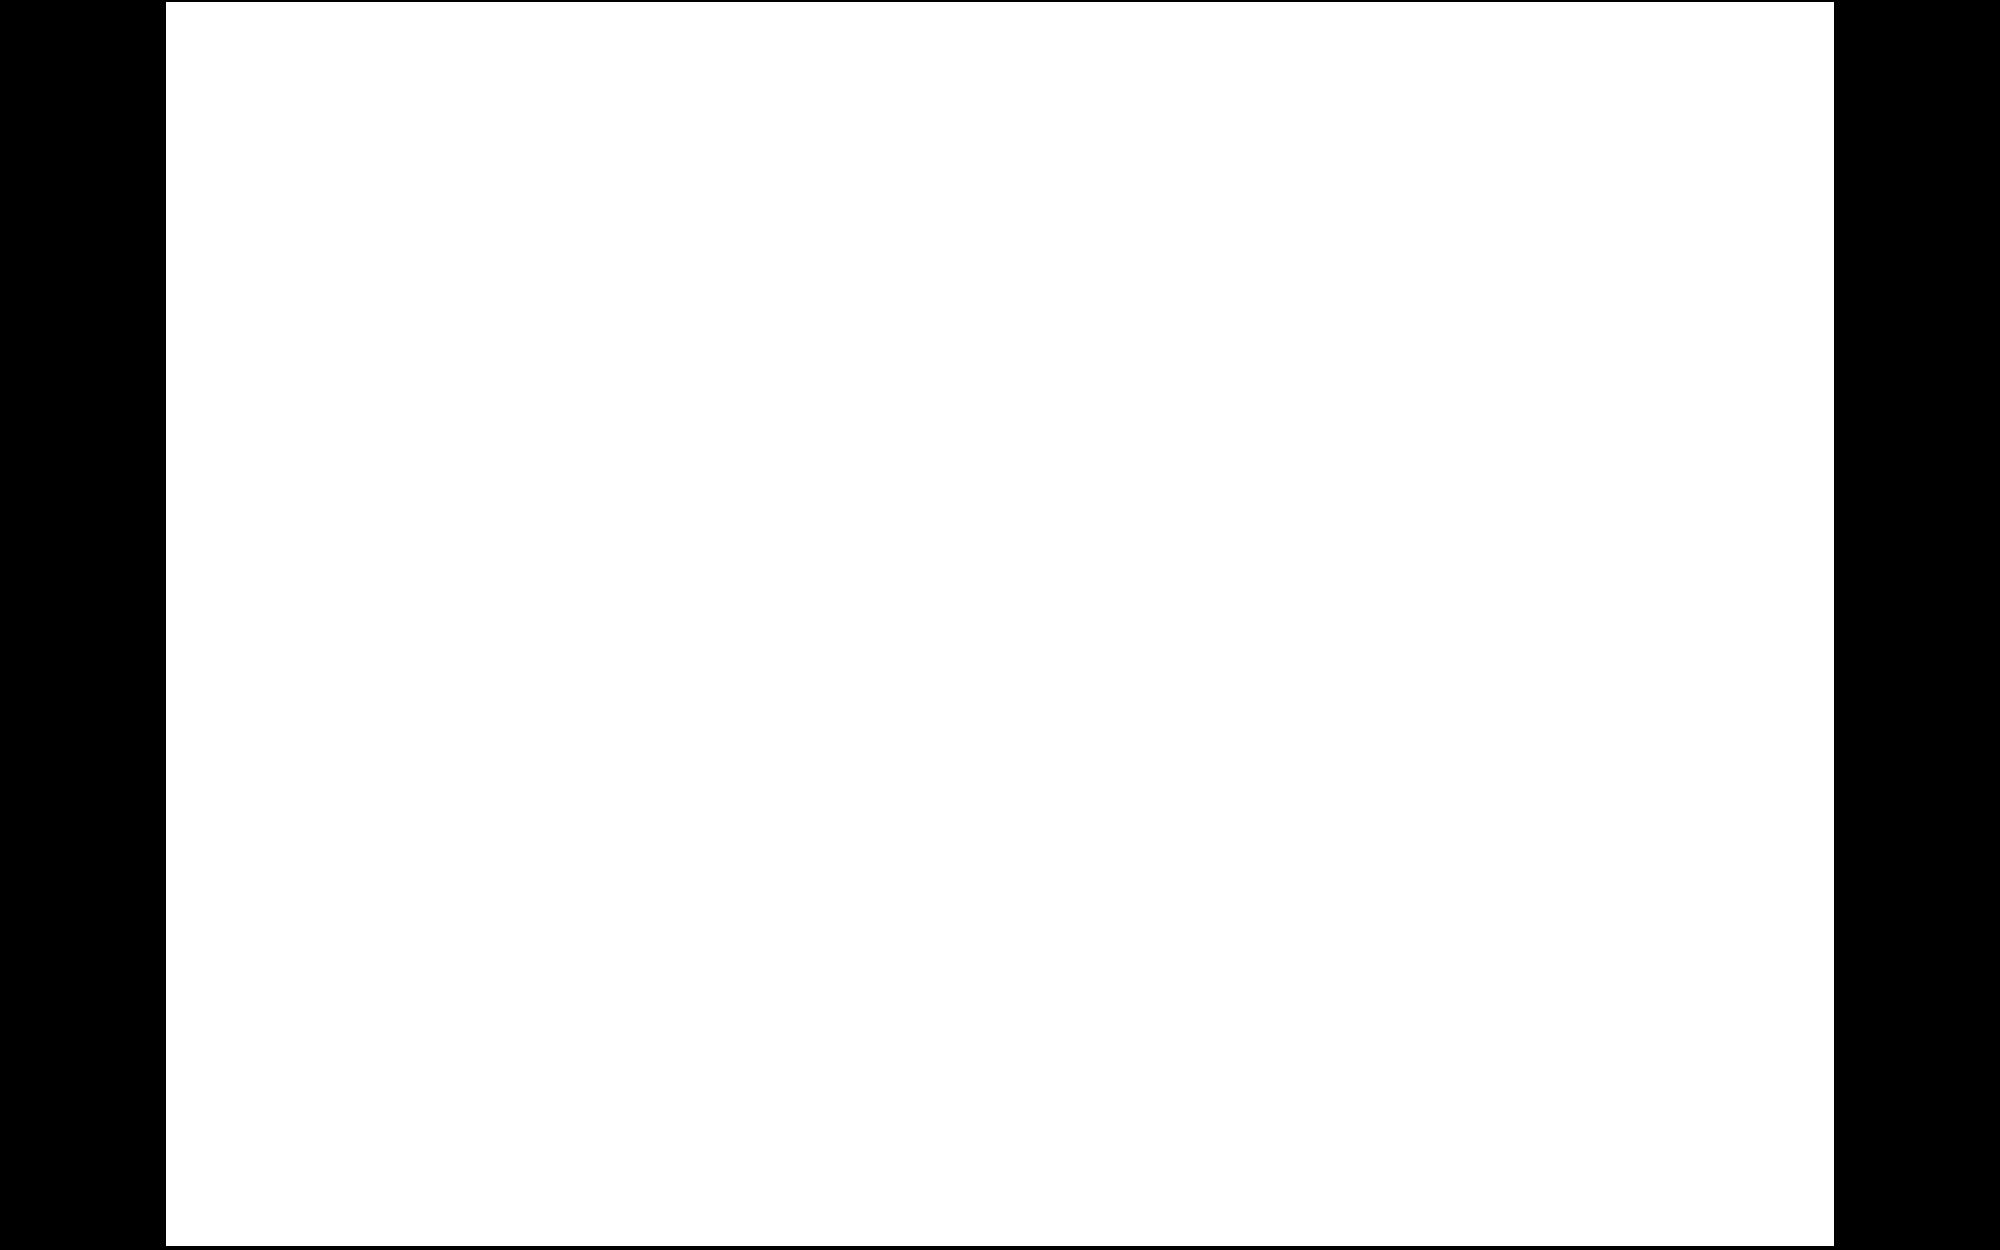 "Washington DC 1792 (orange canvas, 48"" x 30"")"